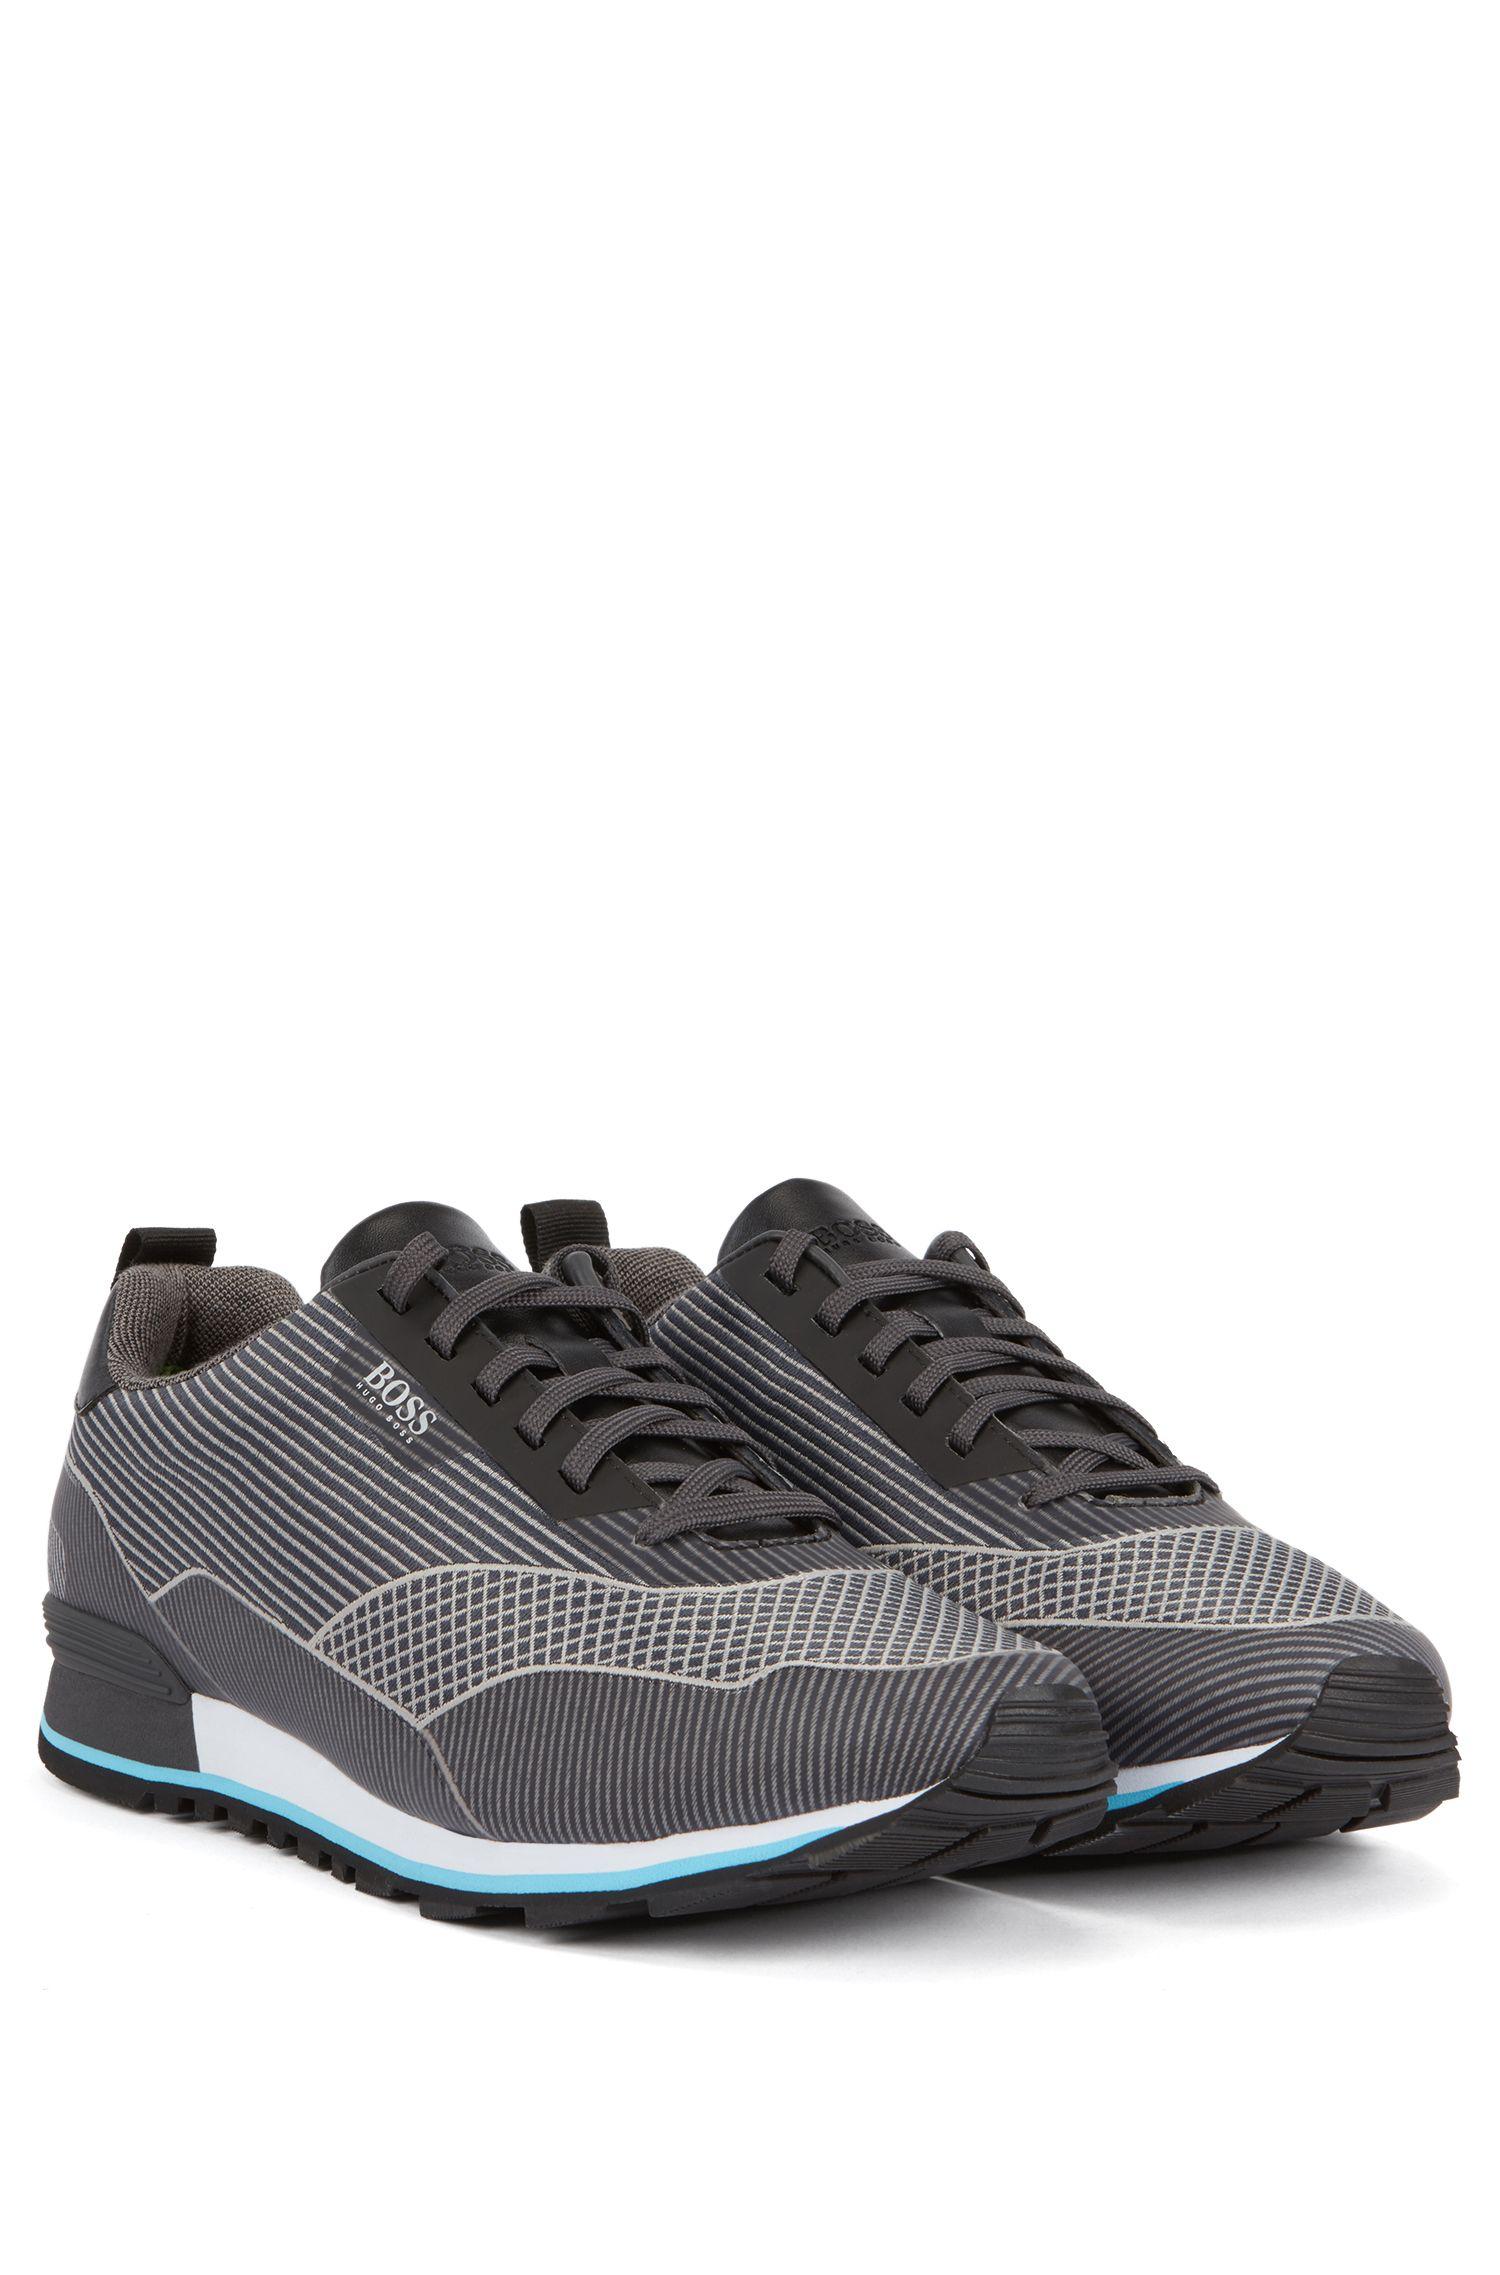 Running-inspired sneakers in jacquard nylon, Grey